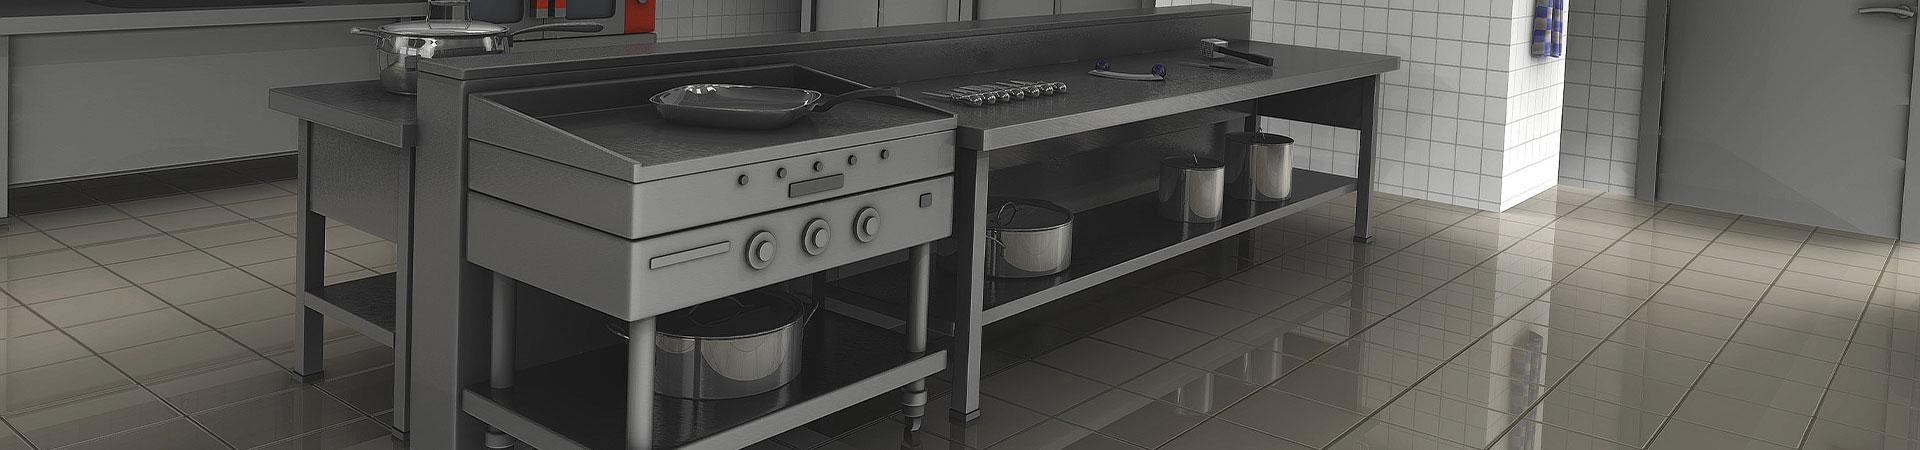 Kitchen-deep-cleaning-parallax